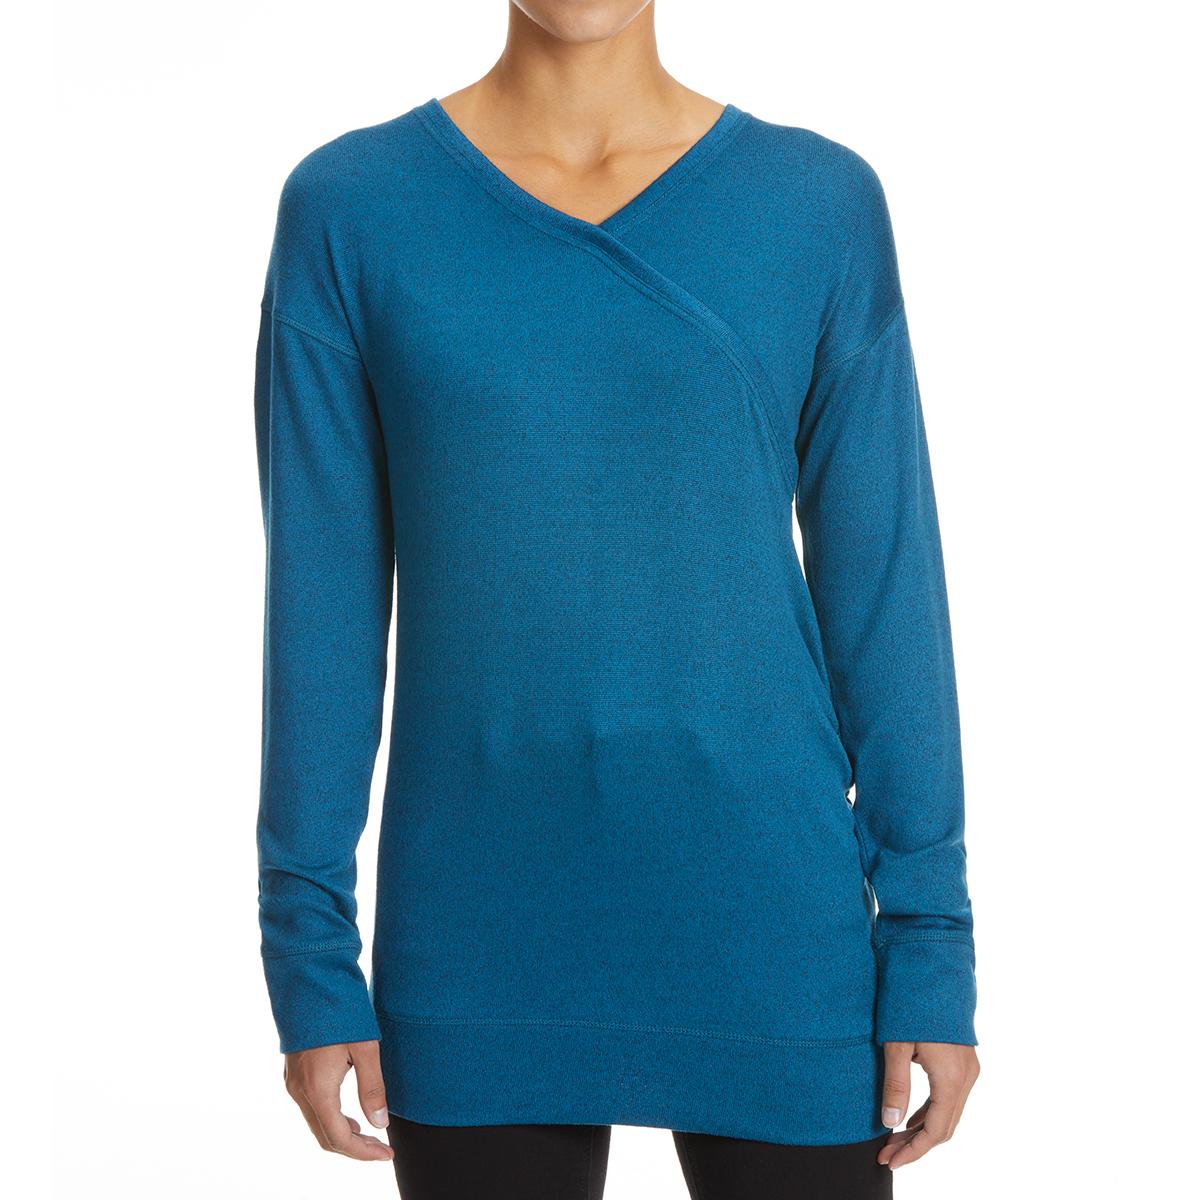 Ems Women's Cochituate Long-Sleeve Wrap - Blue, XL